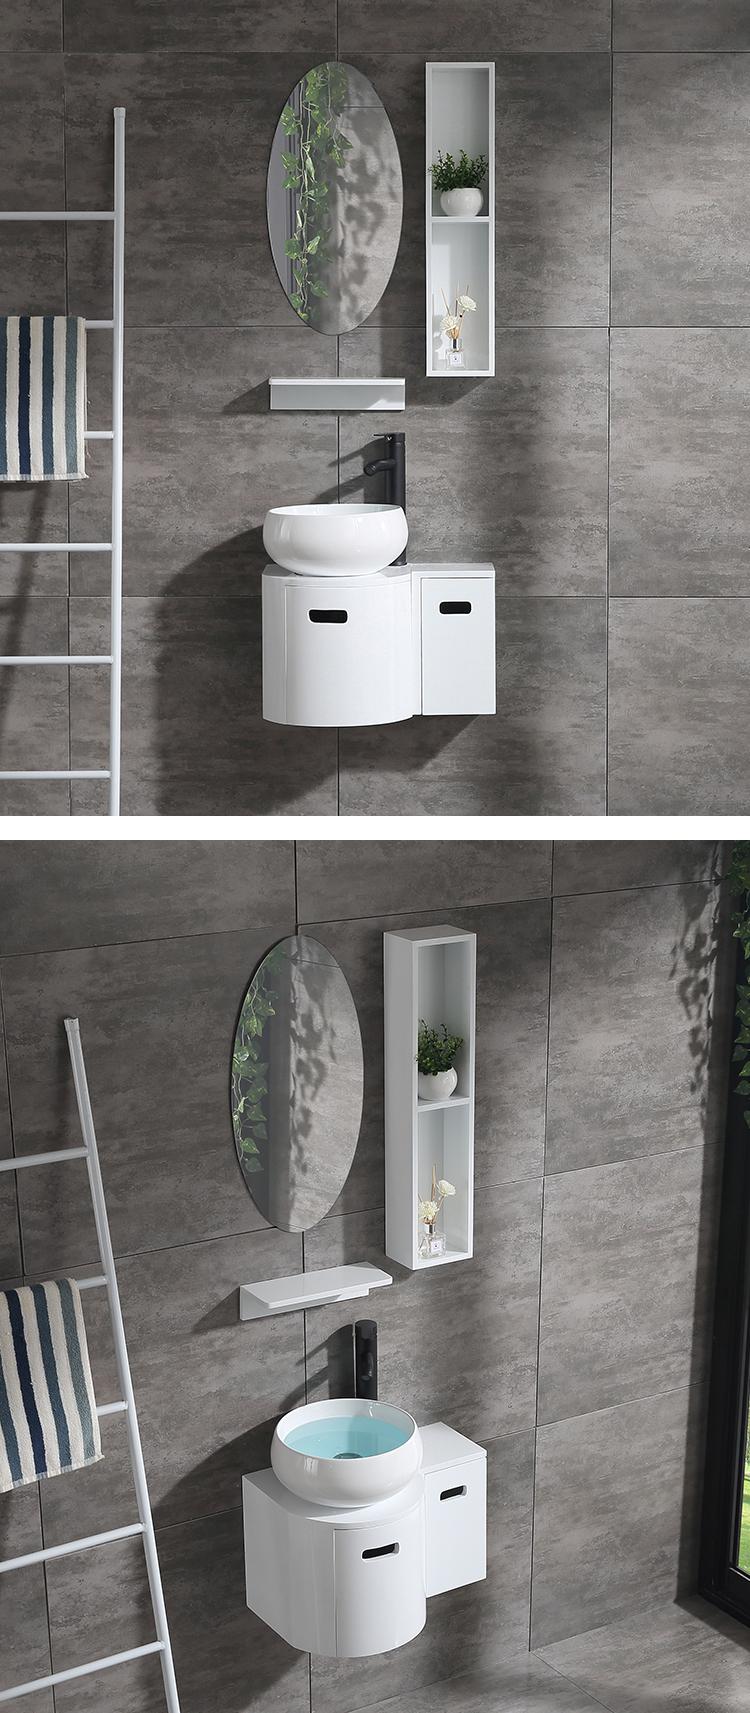 Round Bathroom Vanity Set With Oval Mirror Or Medicine Cabinet For Small Bathroom